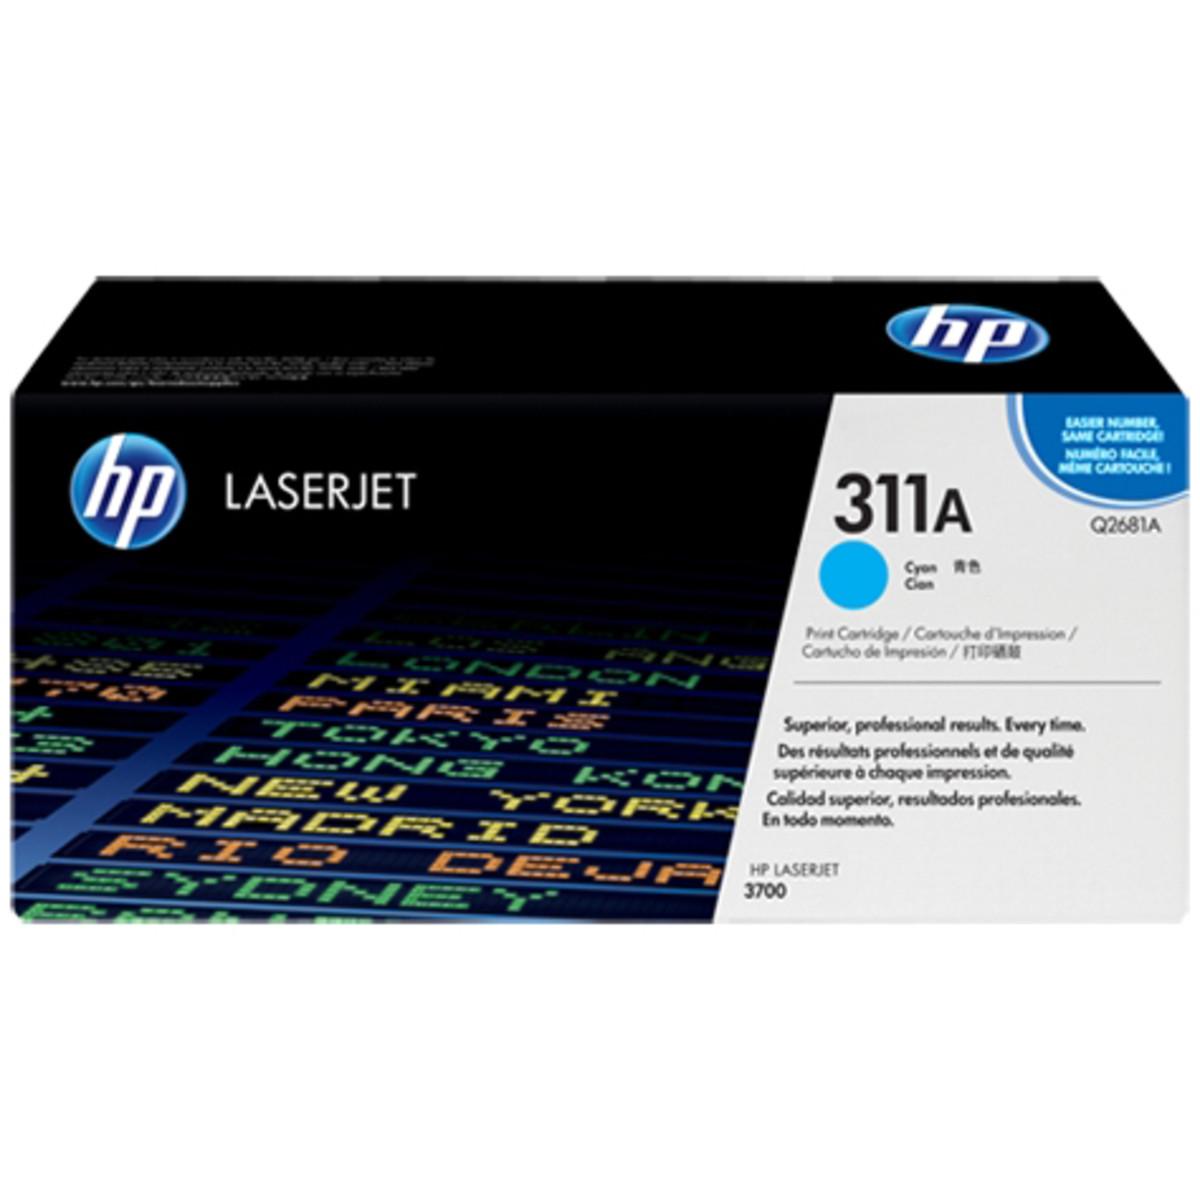 HP 311A (Q2681A) Cyan Toner Cartridge